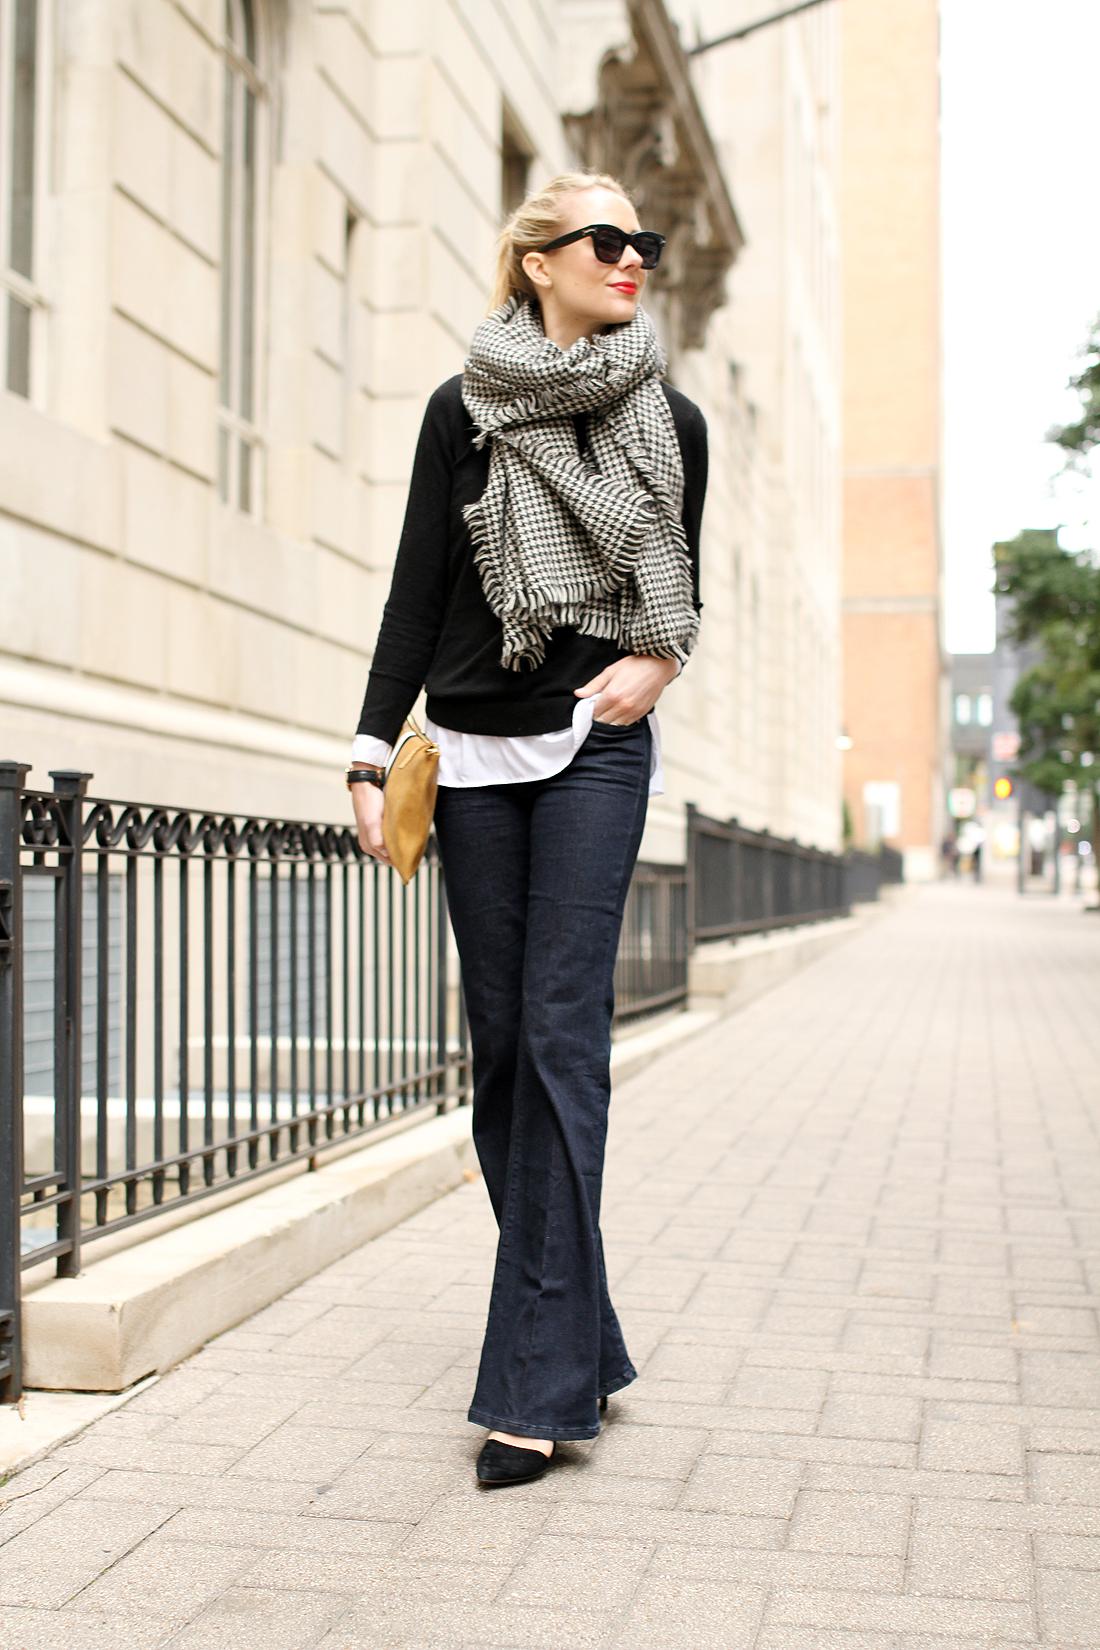 fashion-jackson-houndstooth-scarf-denim-flare-jeans-black-sweater-black-pumps